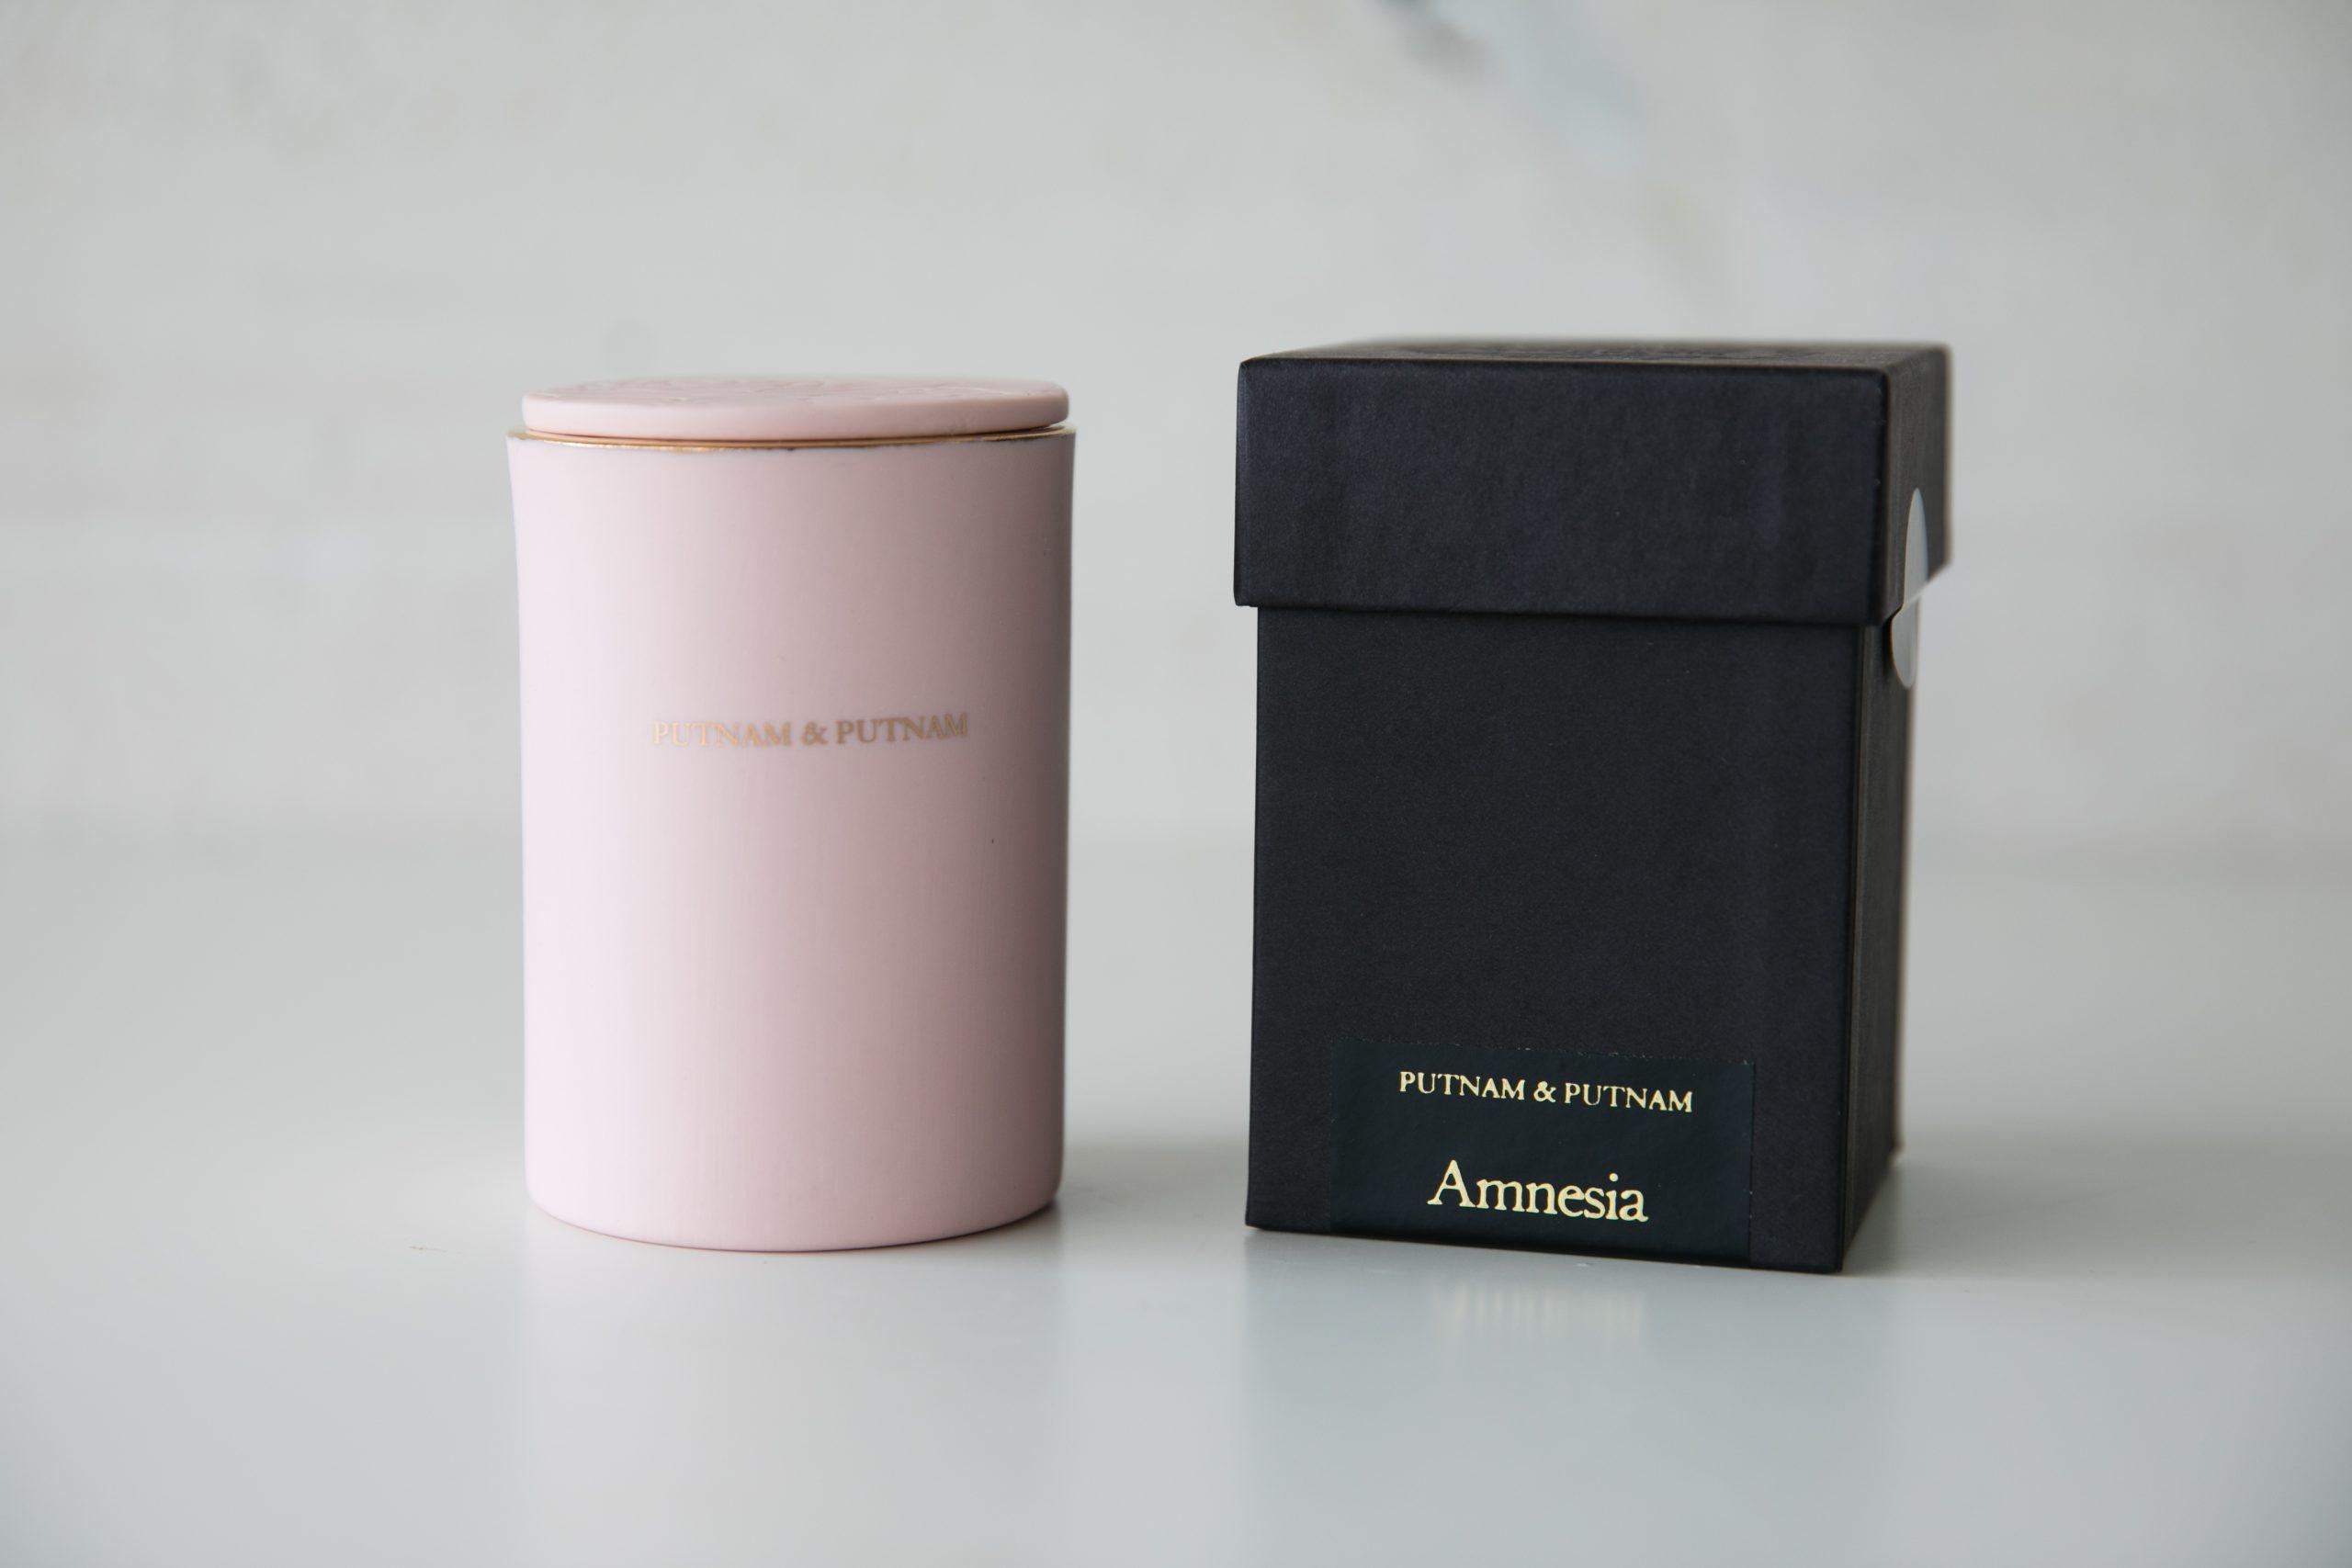 amnesia candle